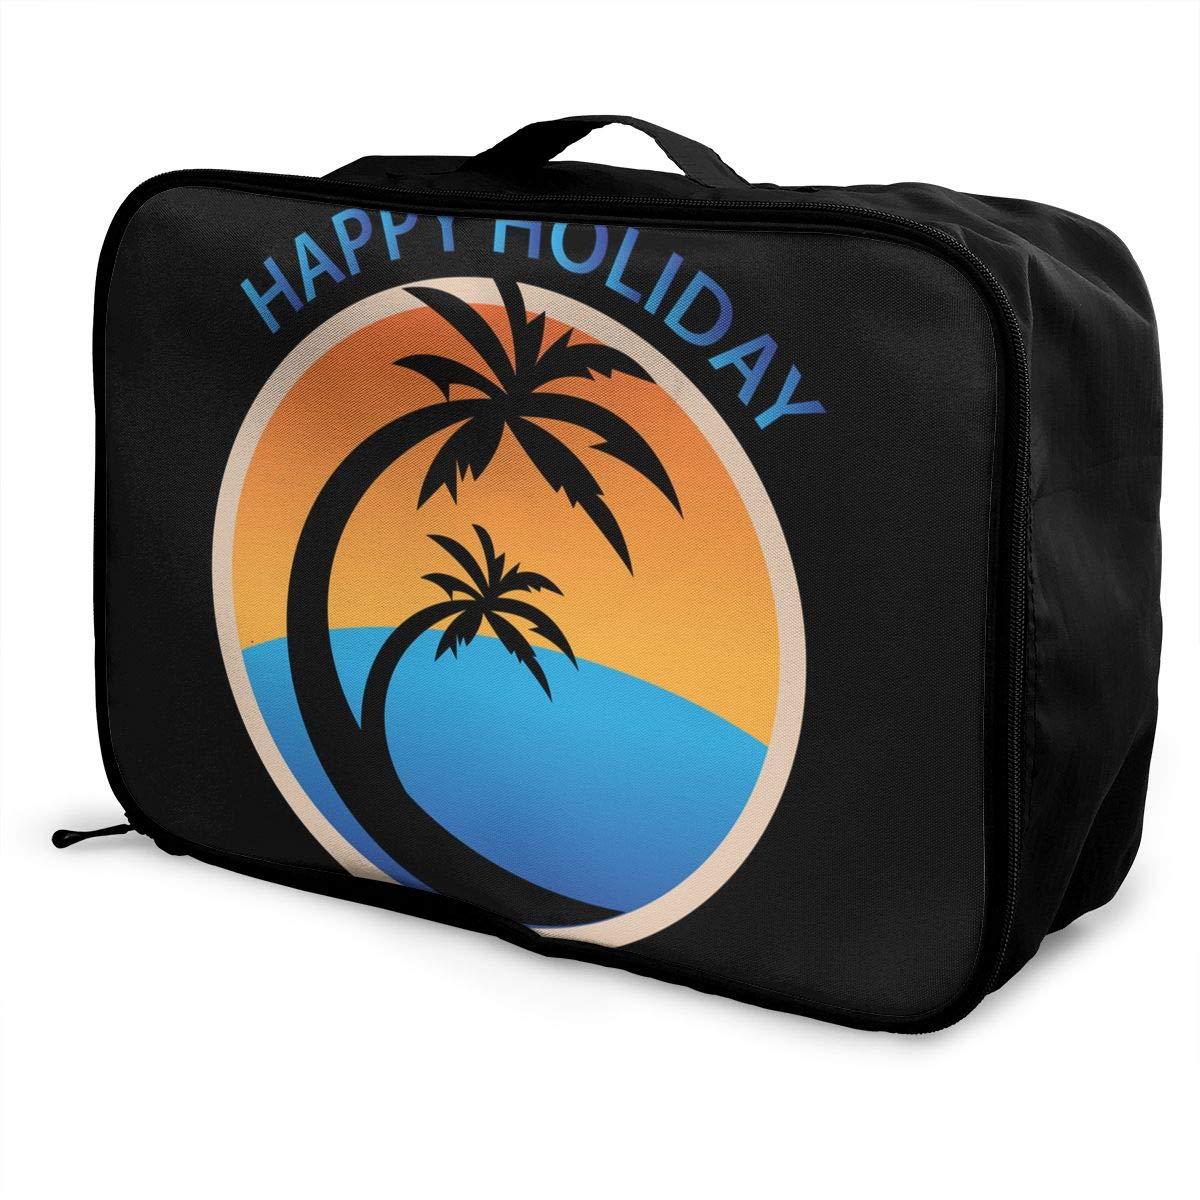 ADGAI Tropical Summer Canvas Travel Weekender Bag,Fashion Custom Lightweight Large Capacity Portable Luggage Bag,Suitcase Trolley Bag